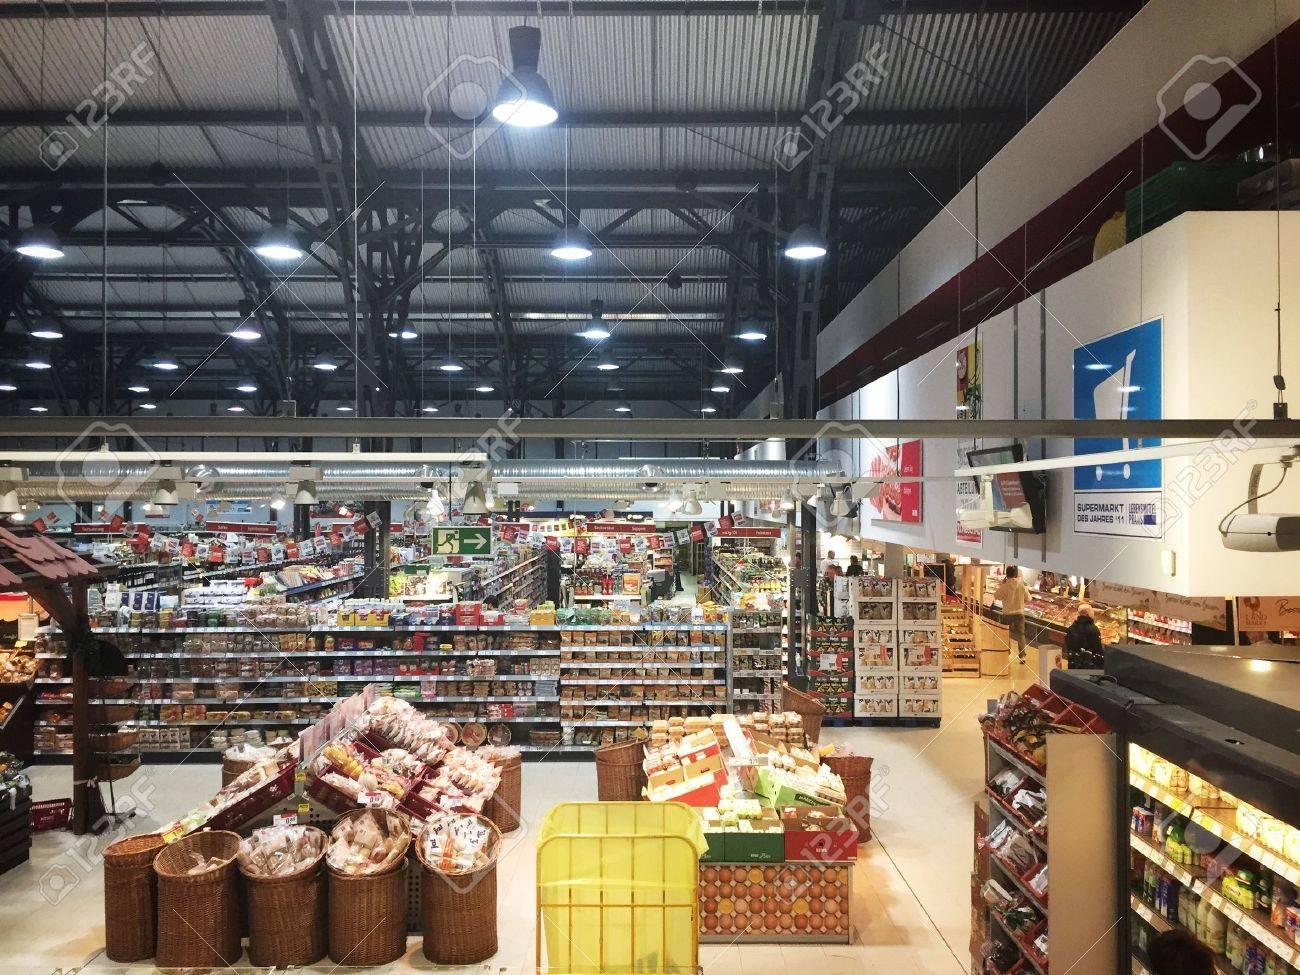 REWE supermarket in Frankfurt - 32161008